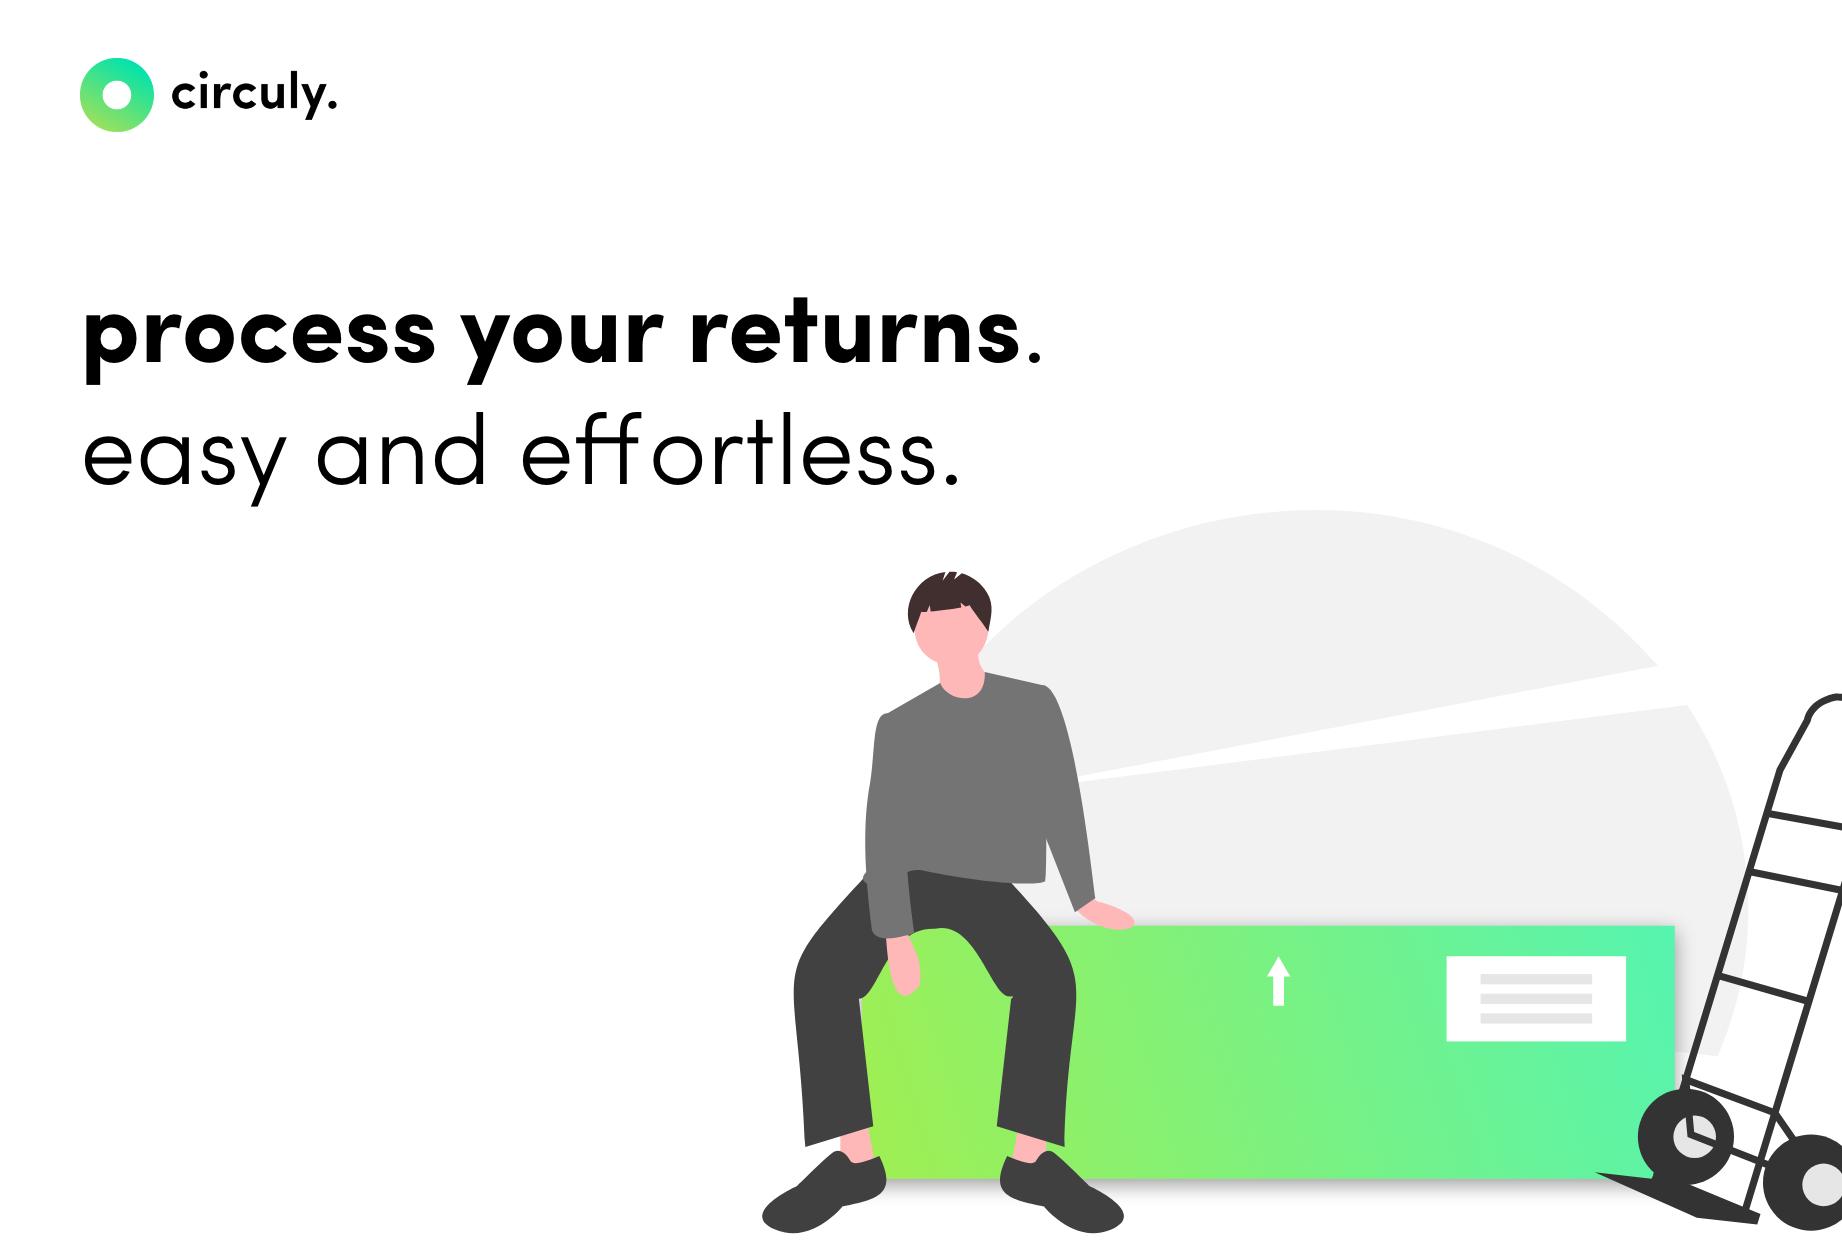 Feature Release: Digital Return Handling and Repair Support